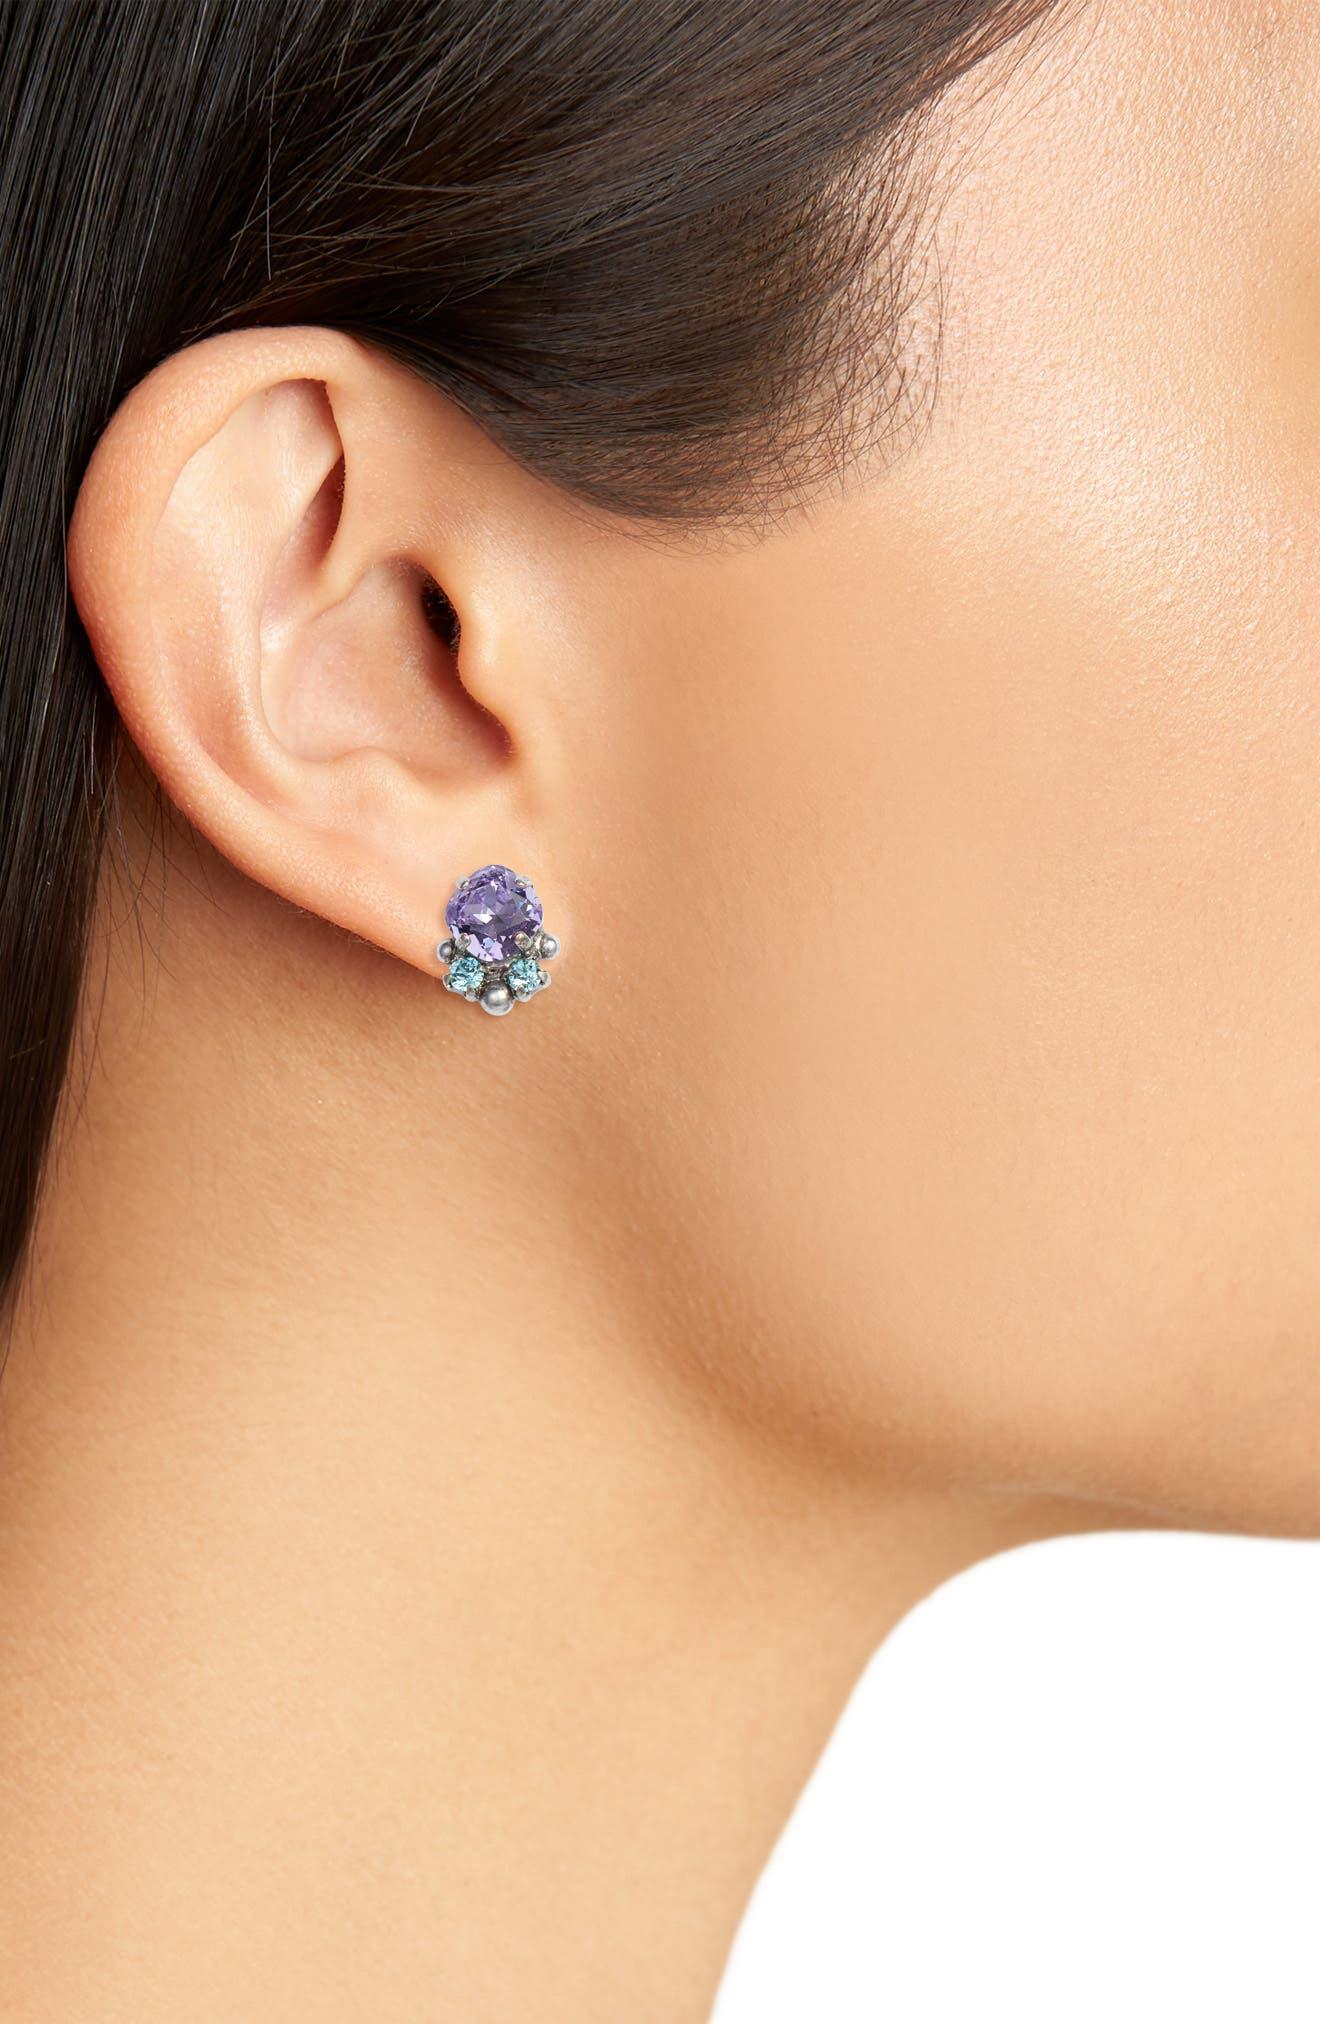 Cushion Cut Crystal Earrings,                             Alternate thumbnail 2, color,                             Purple